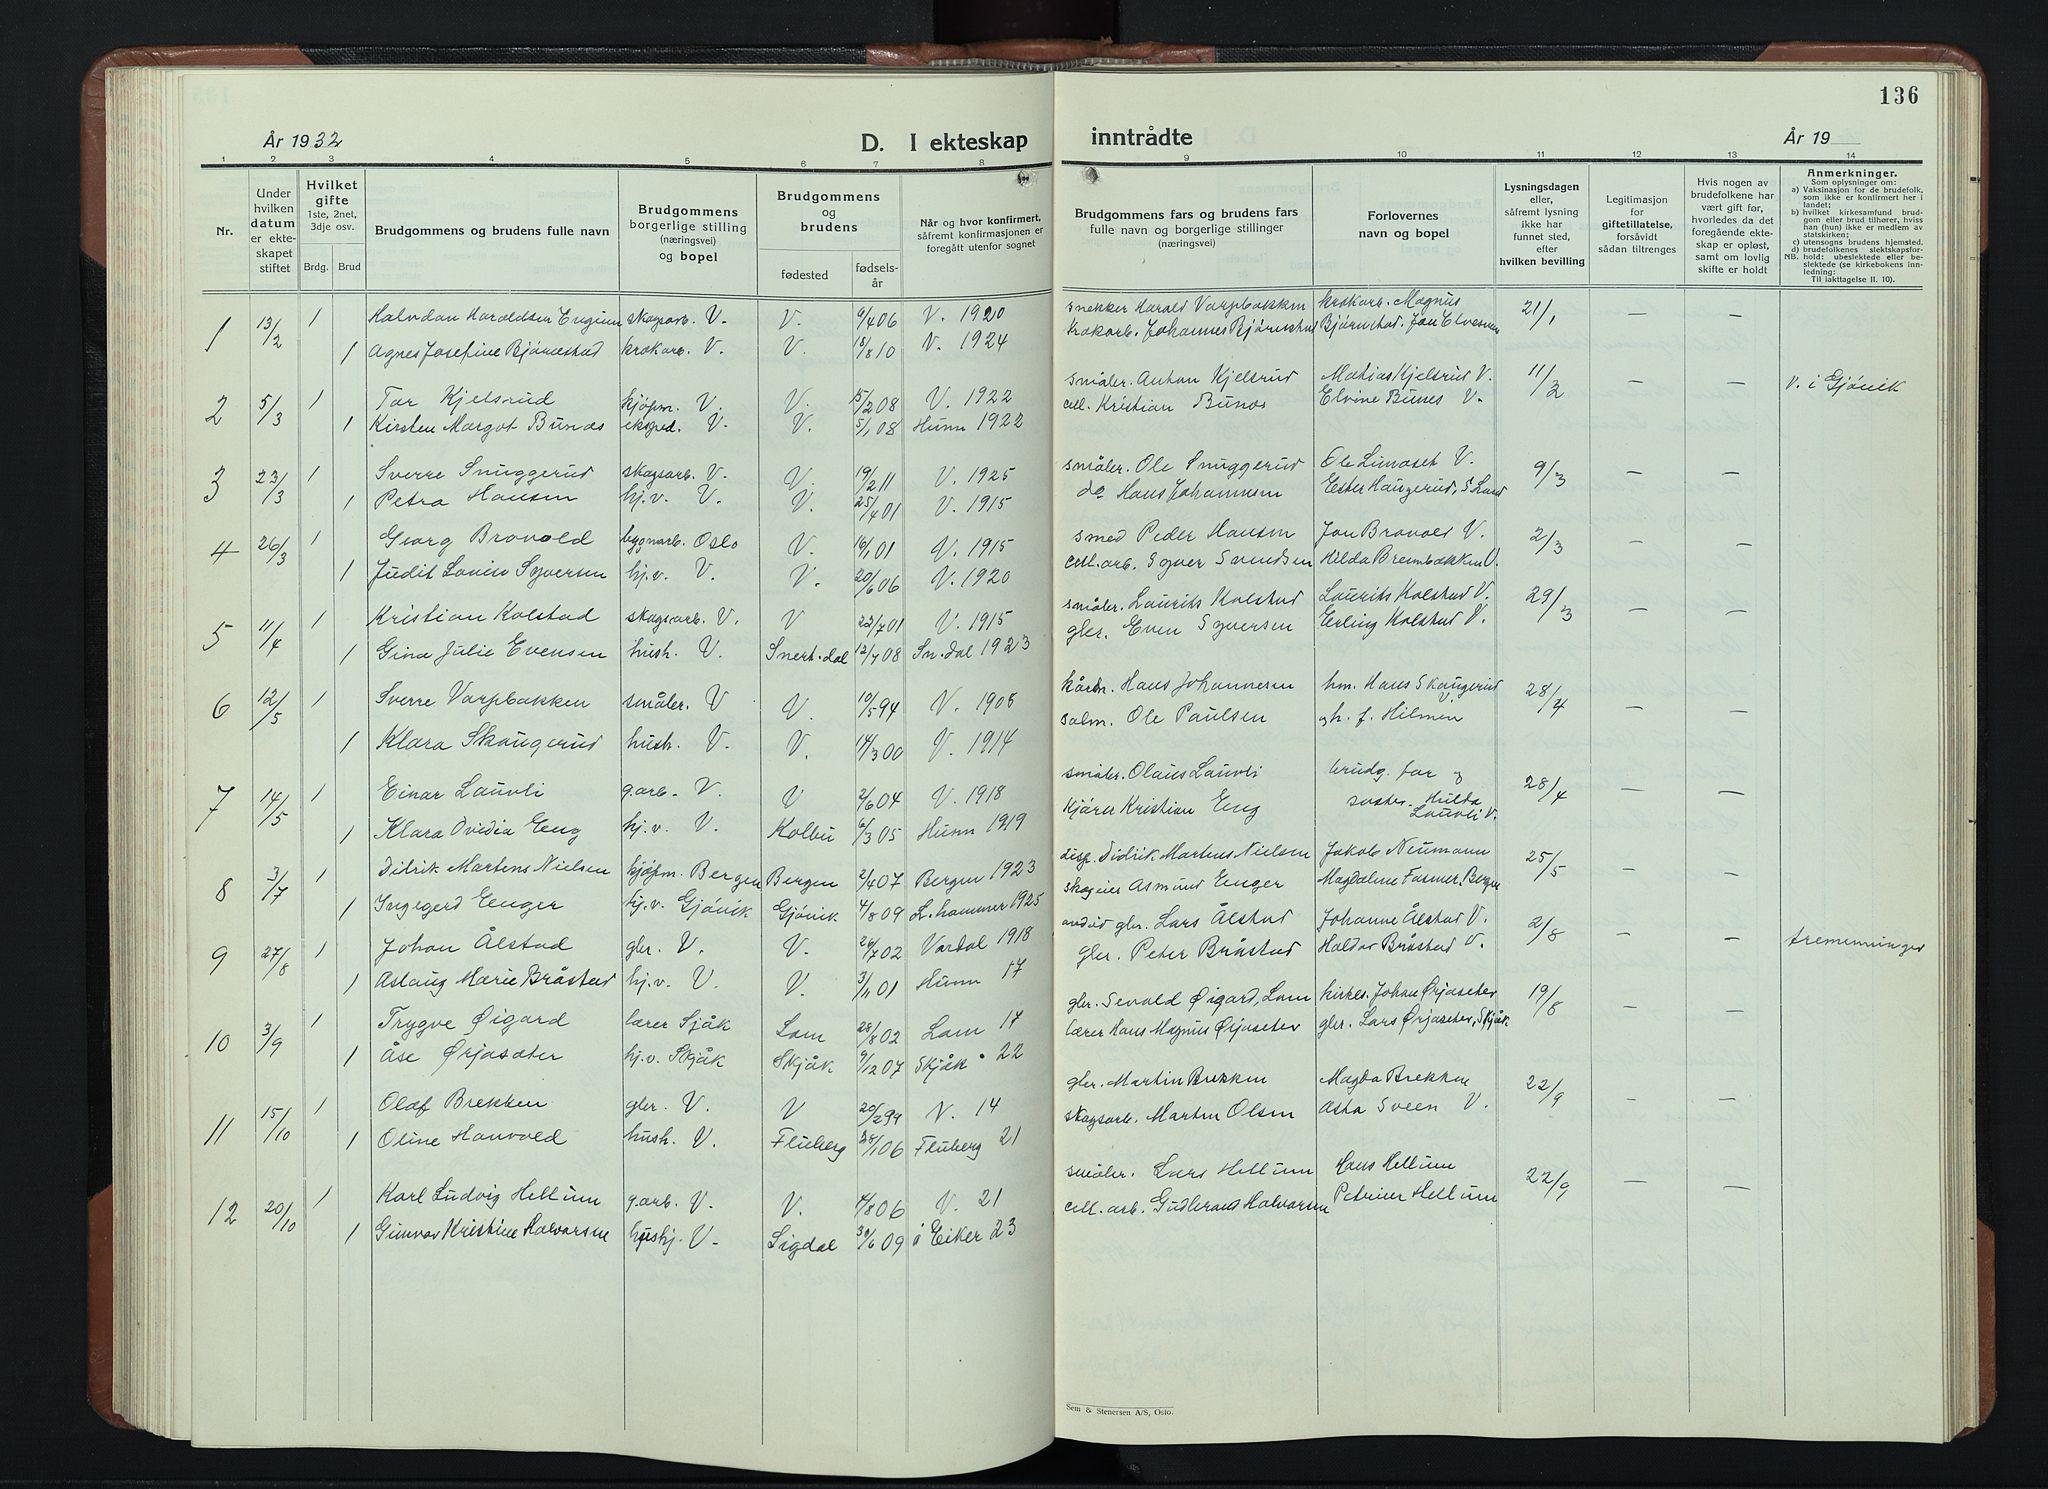 SAH, Vardal prestekontor, H/Ha/Hab/L0018: Klokkerbok nr. 18, 1931-1951, s. 136